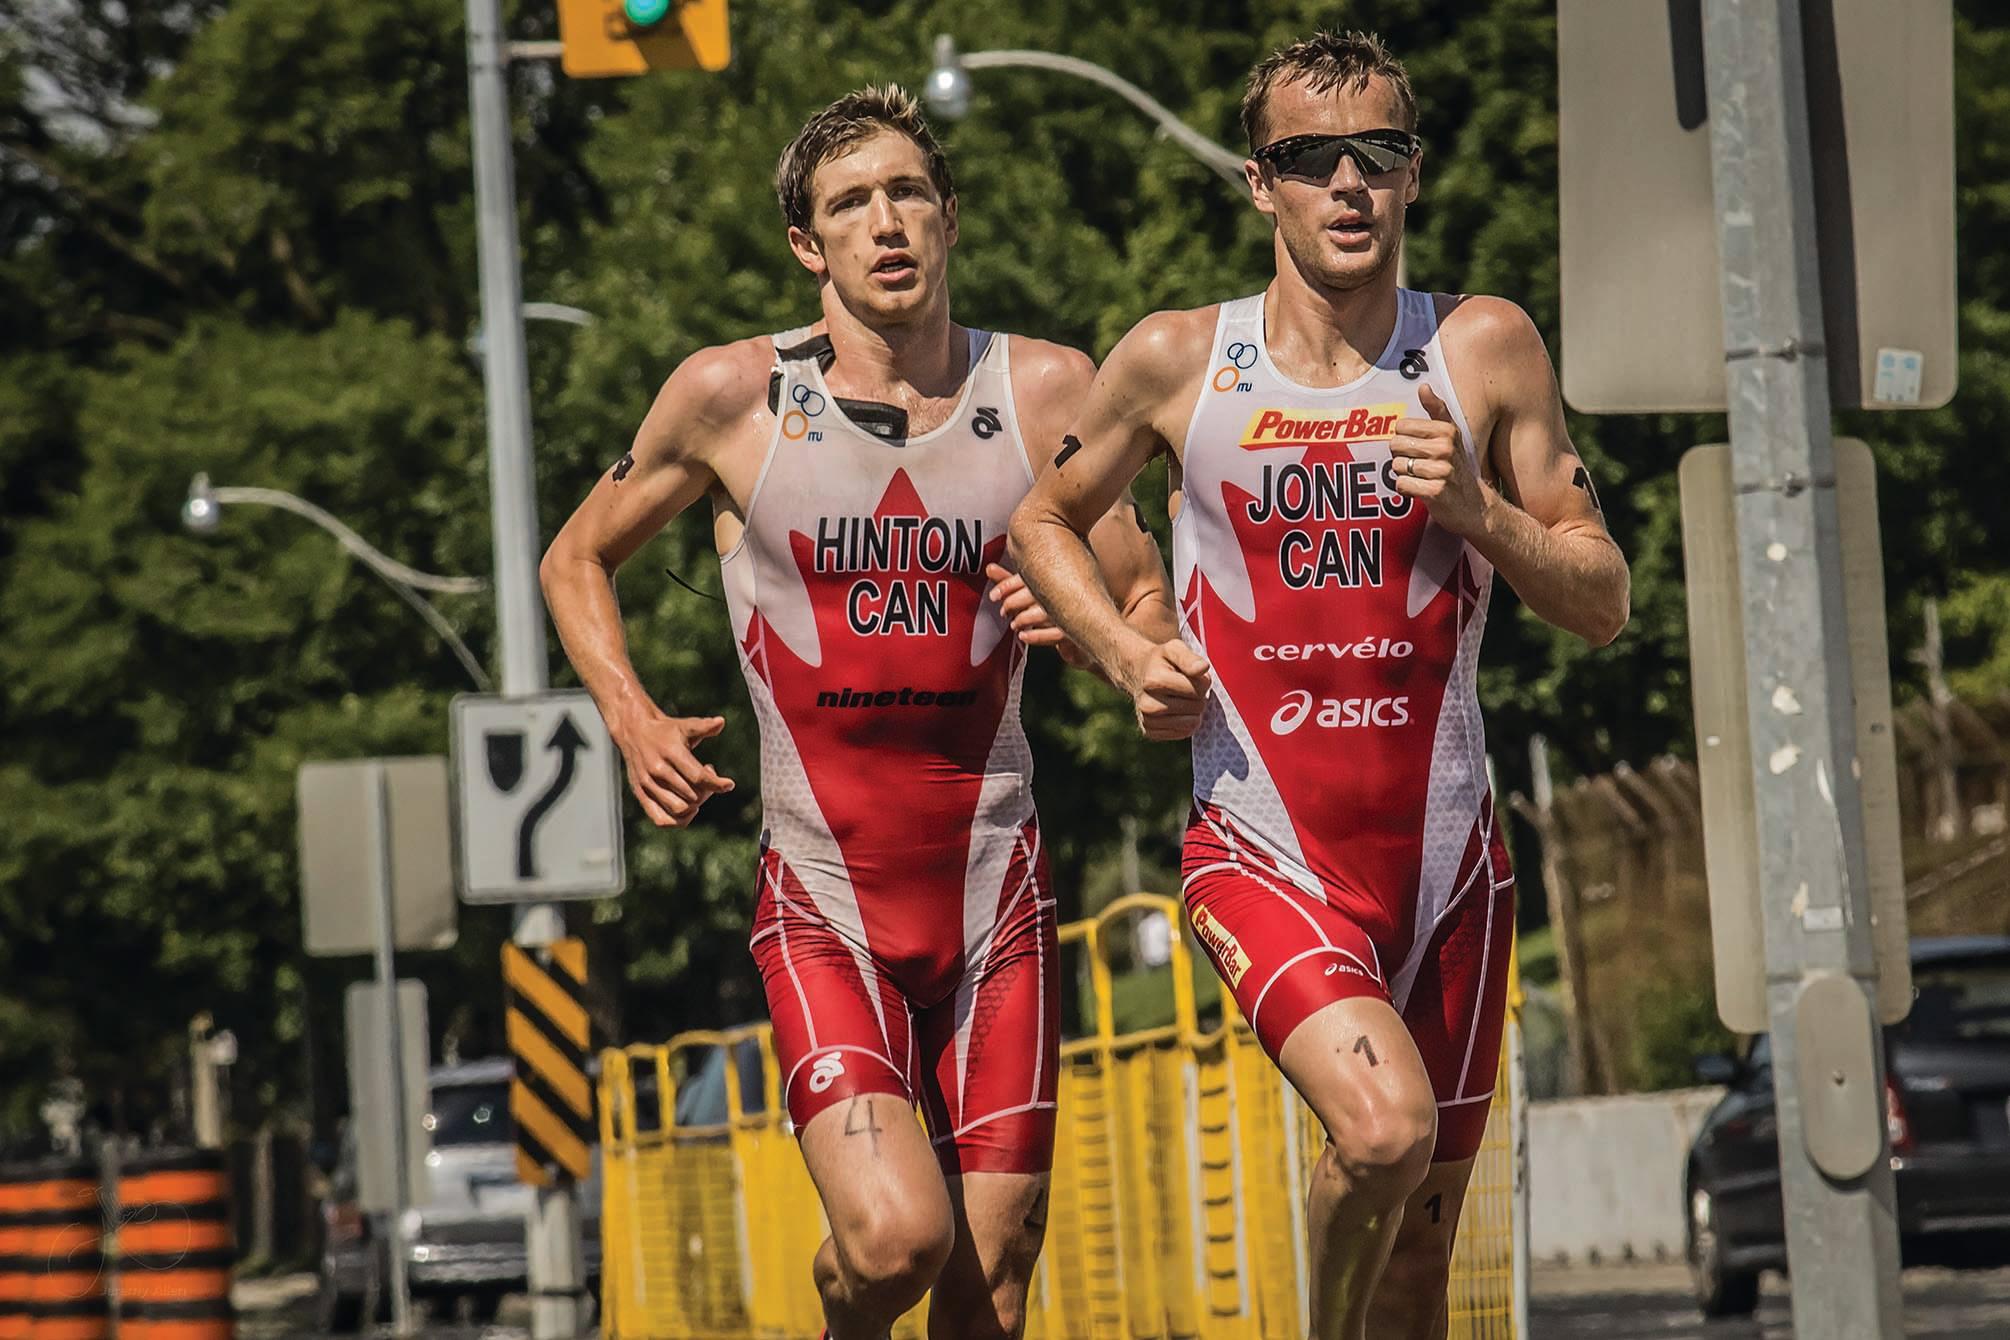 How I Train: Kyle Jones, Olympic Triathlete